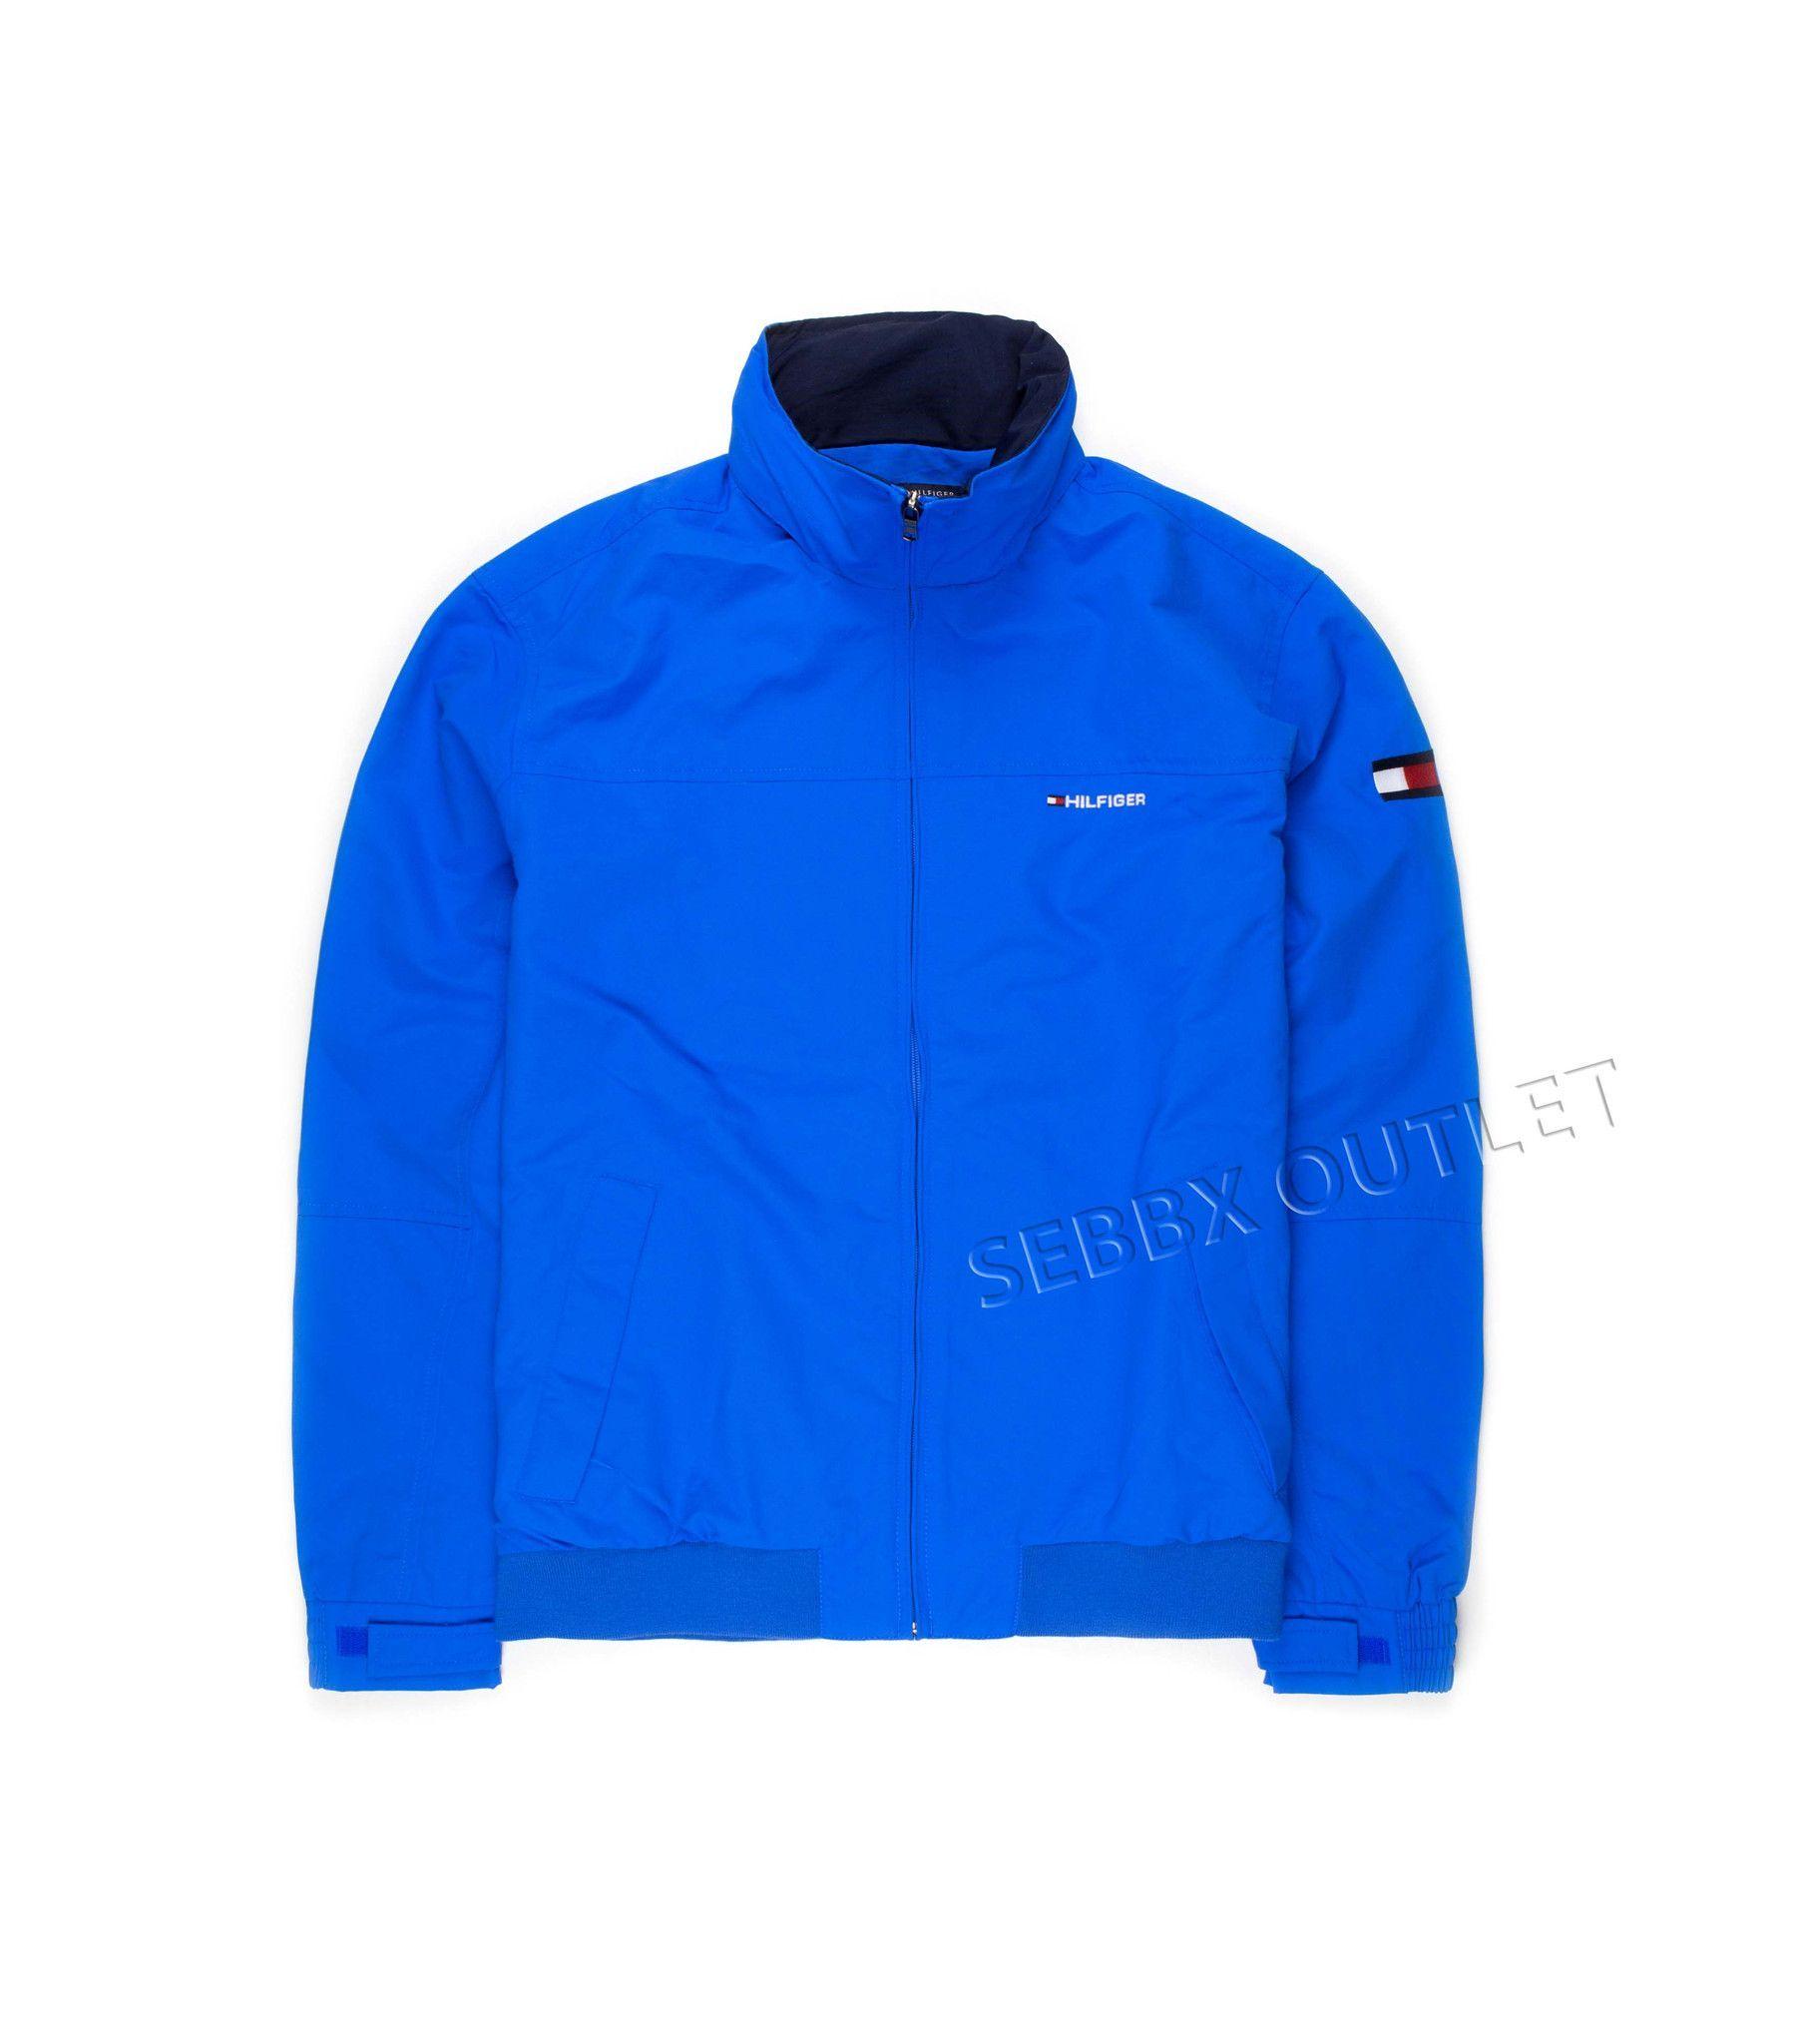 Tommy Hilfiger Yacht Jacket Coat Blue Zip Down | Jacket ...